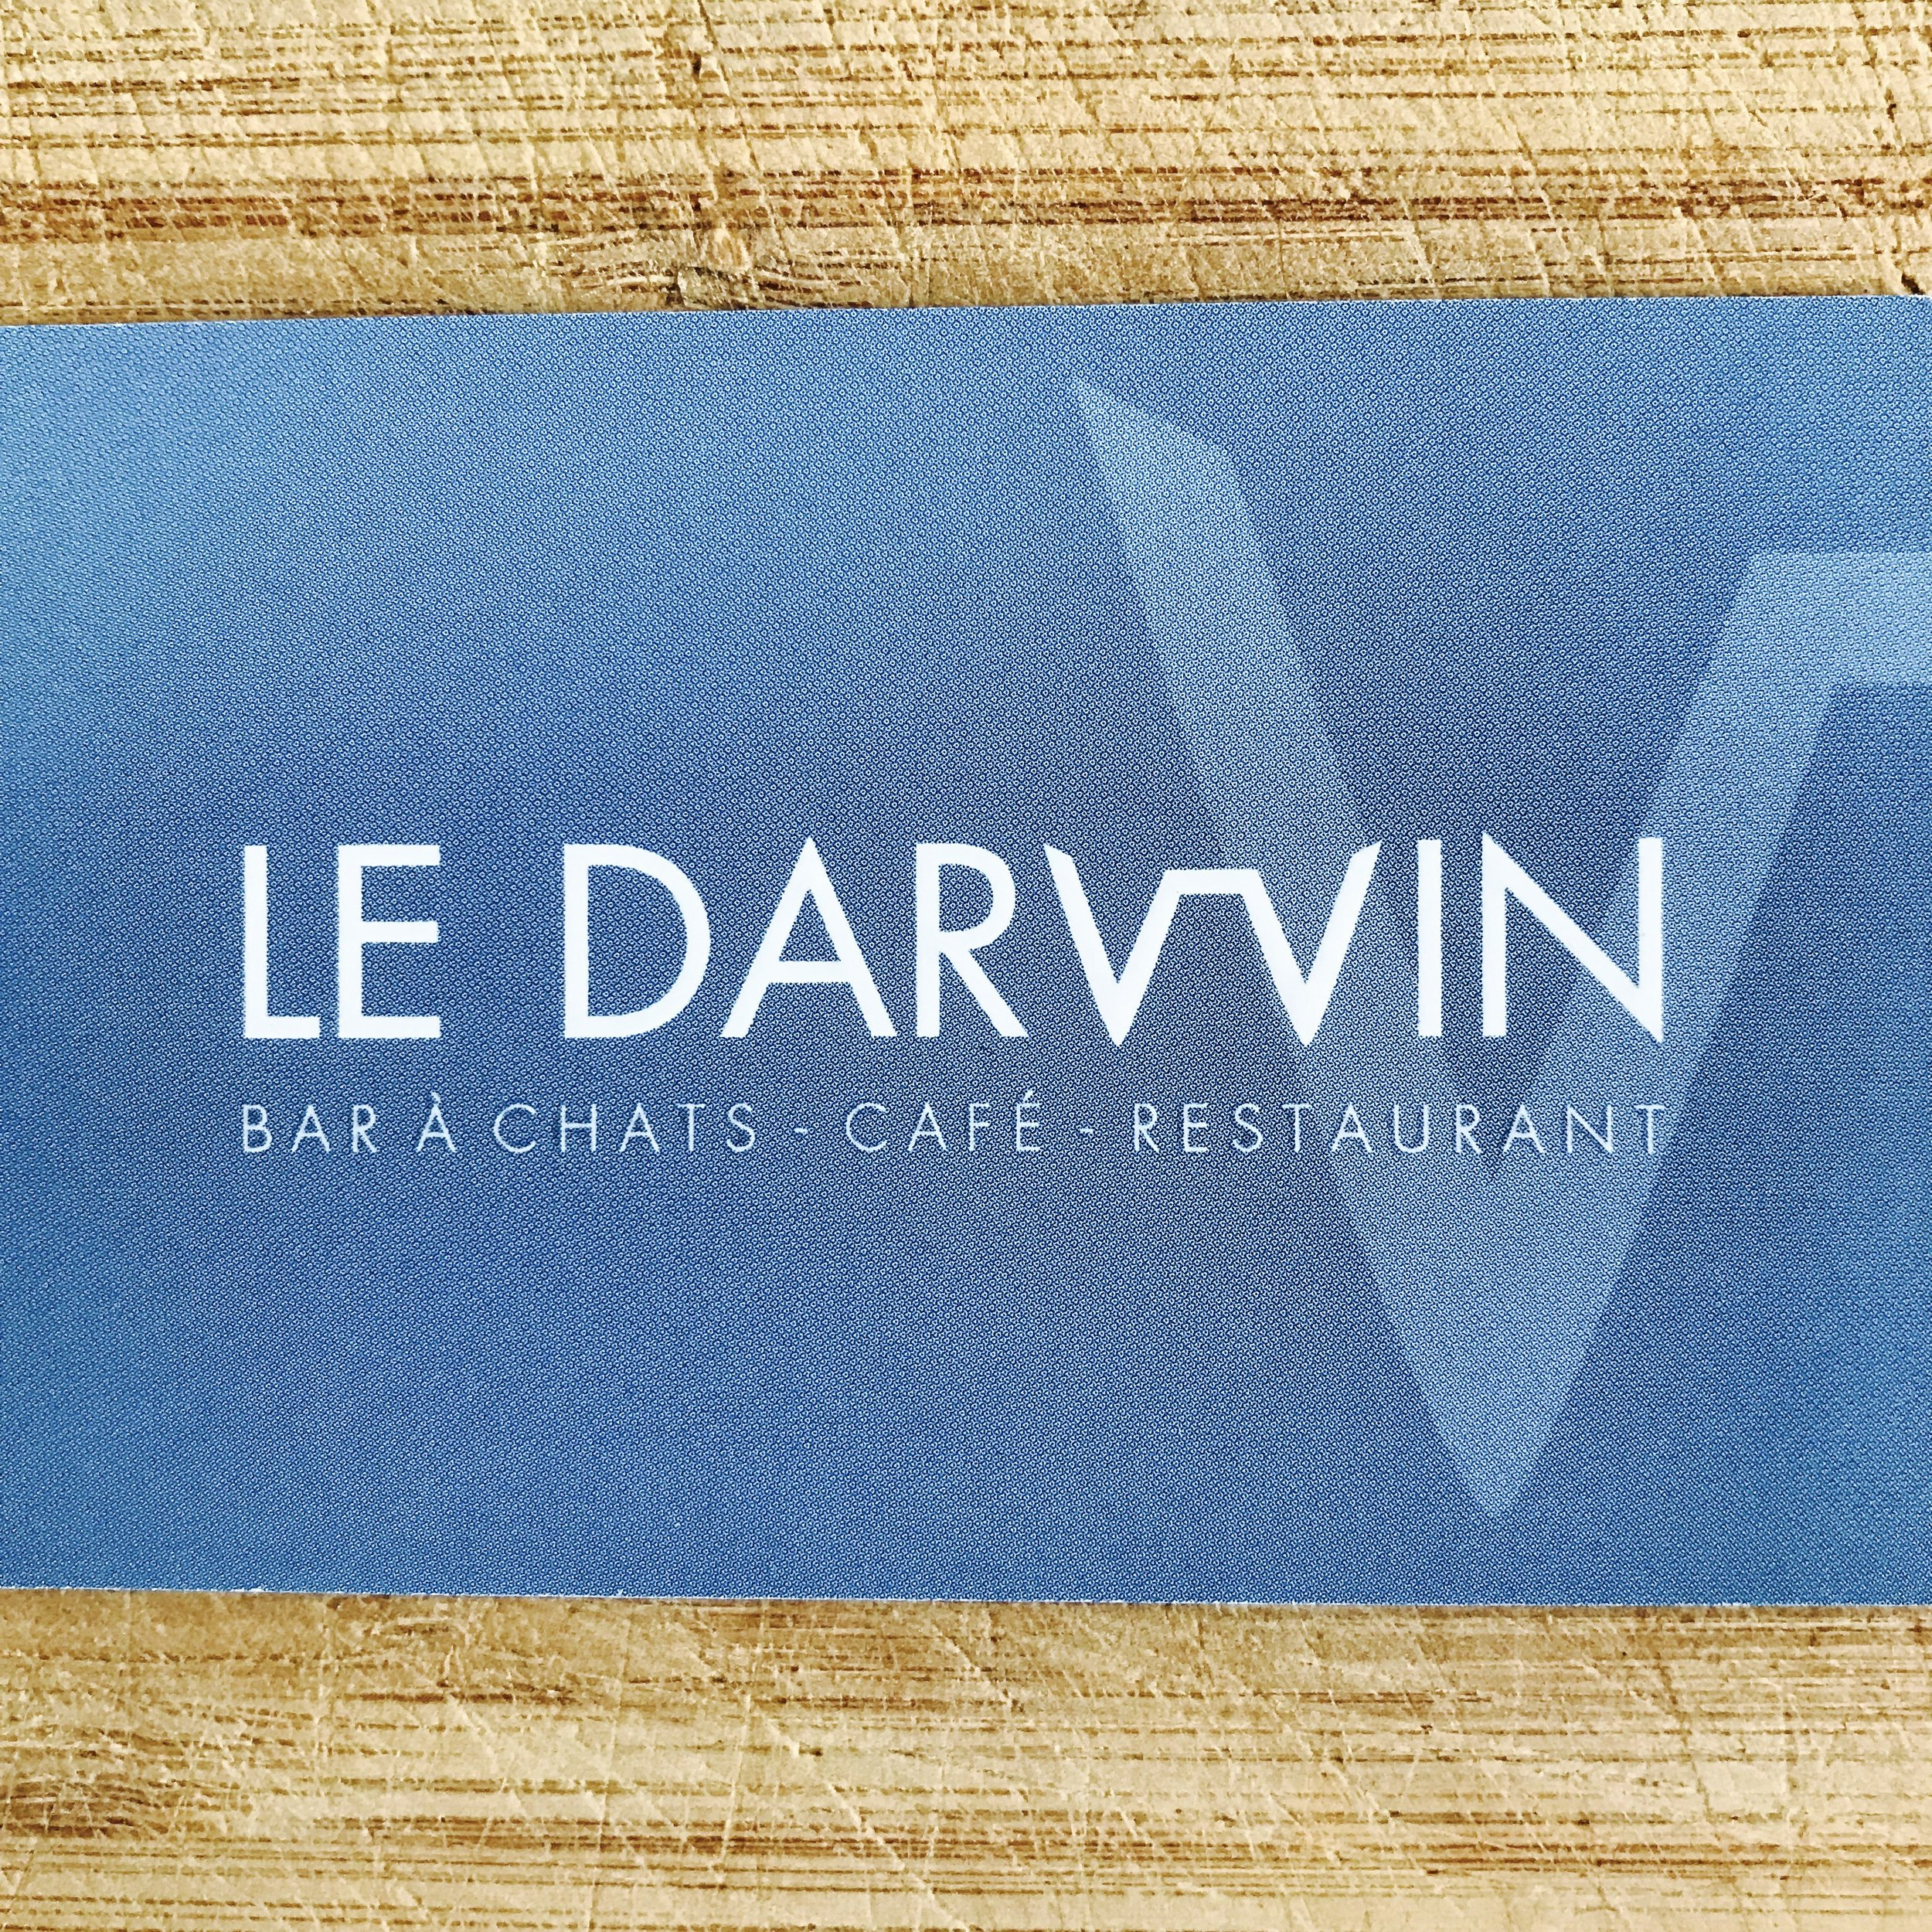 LeDarwin-01.jpg